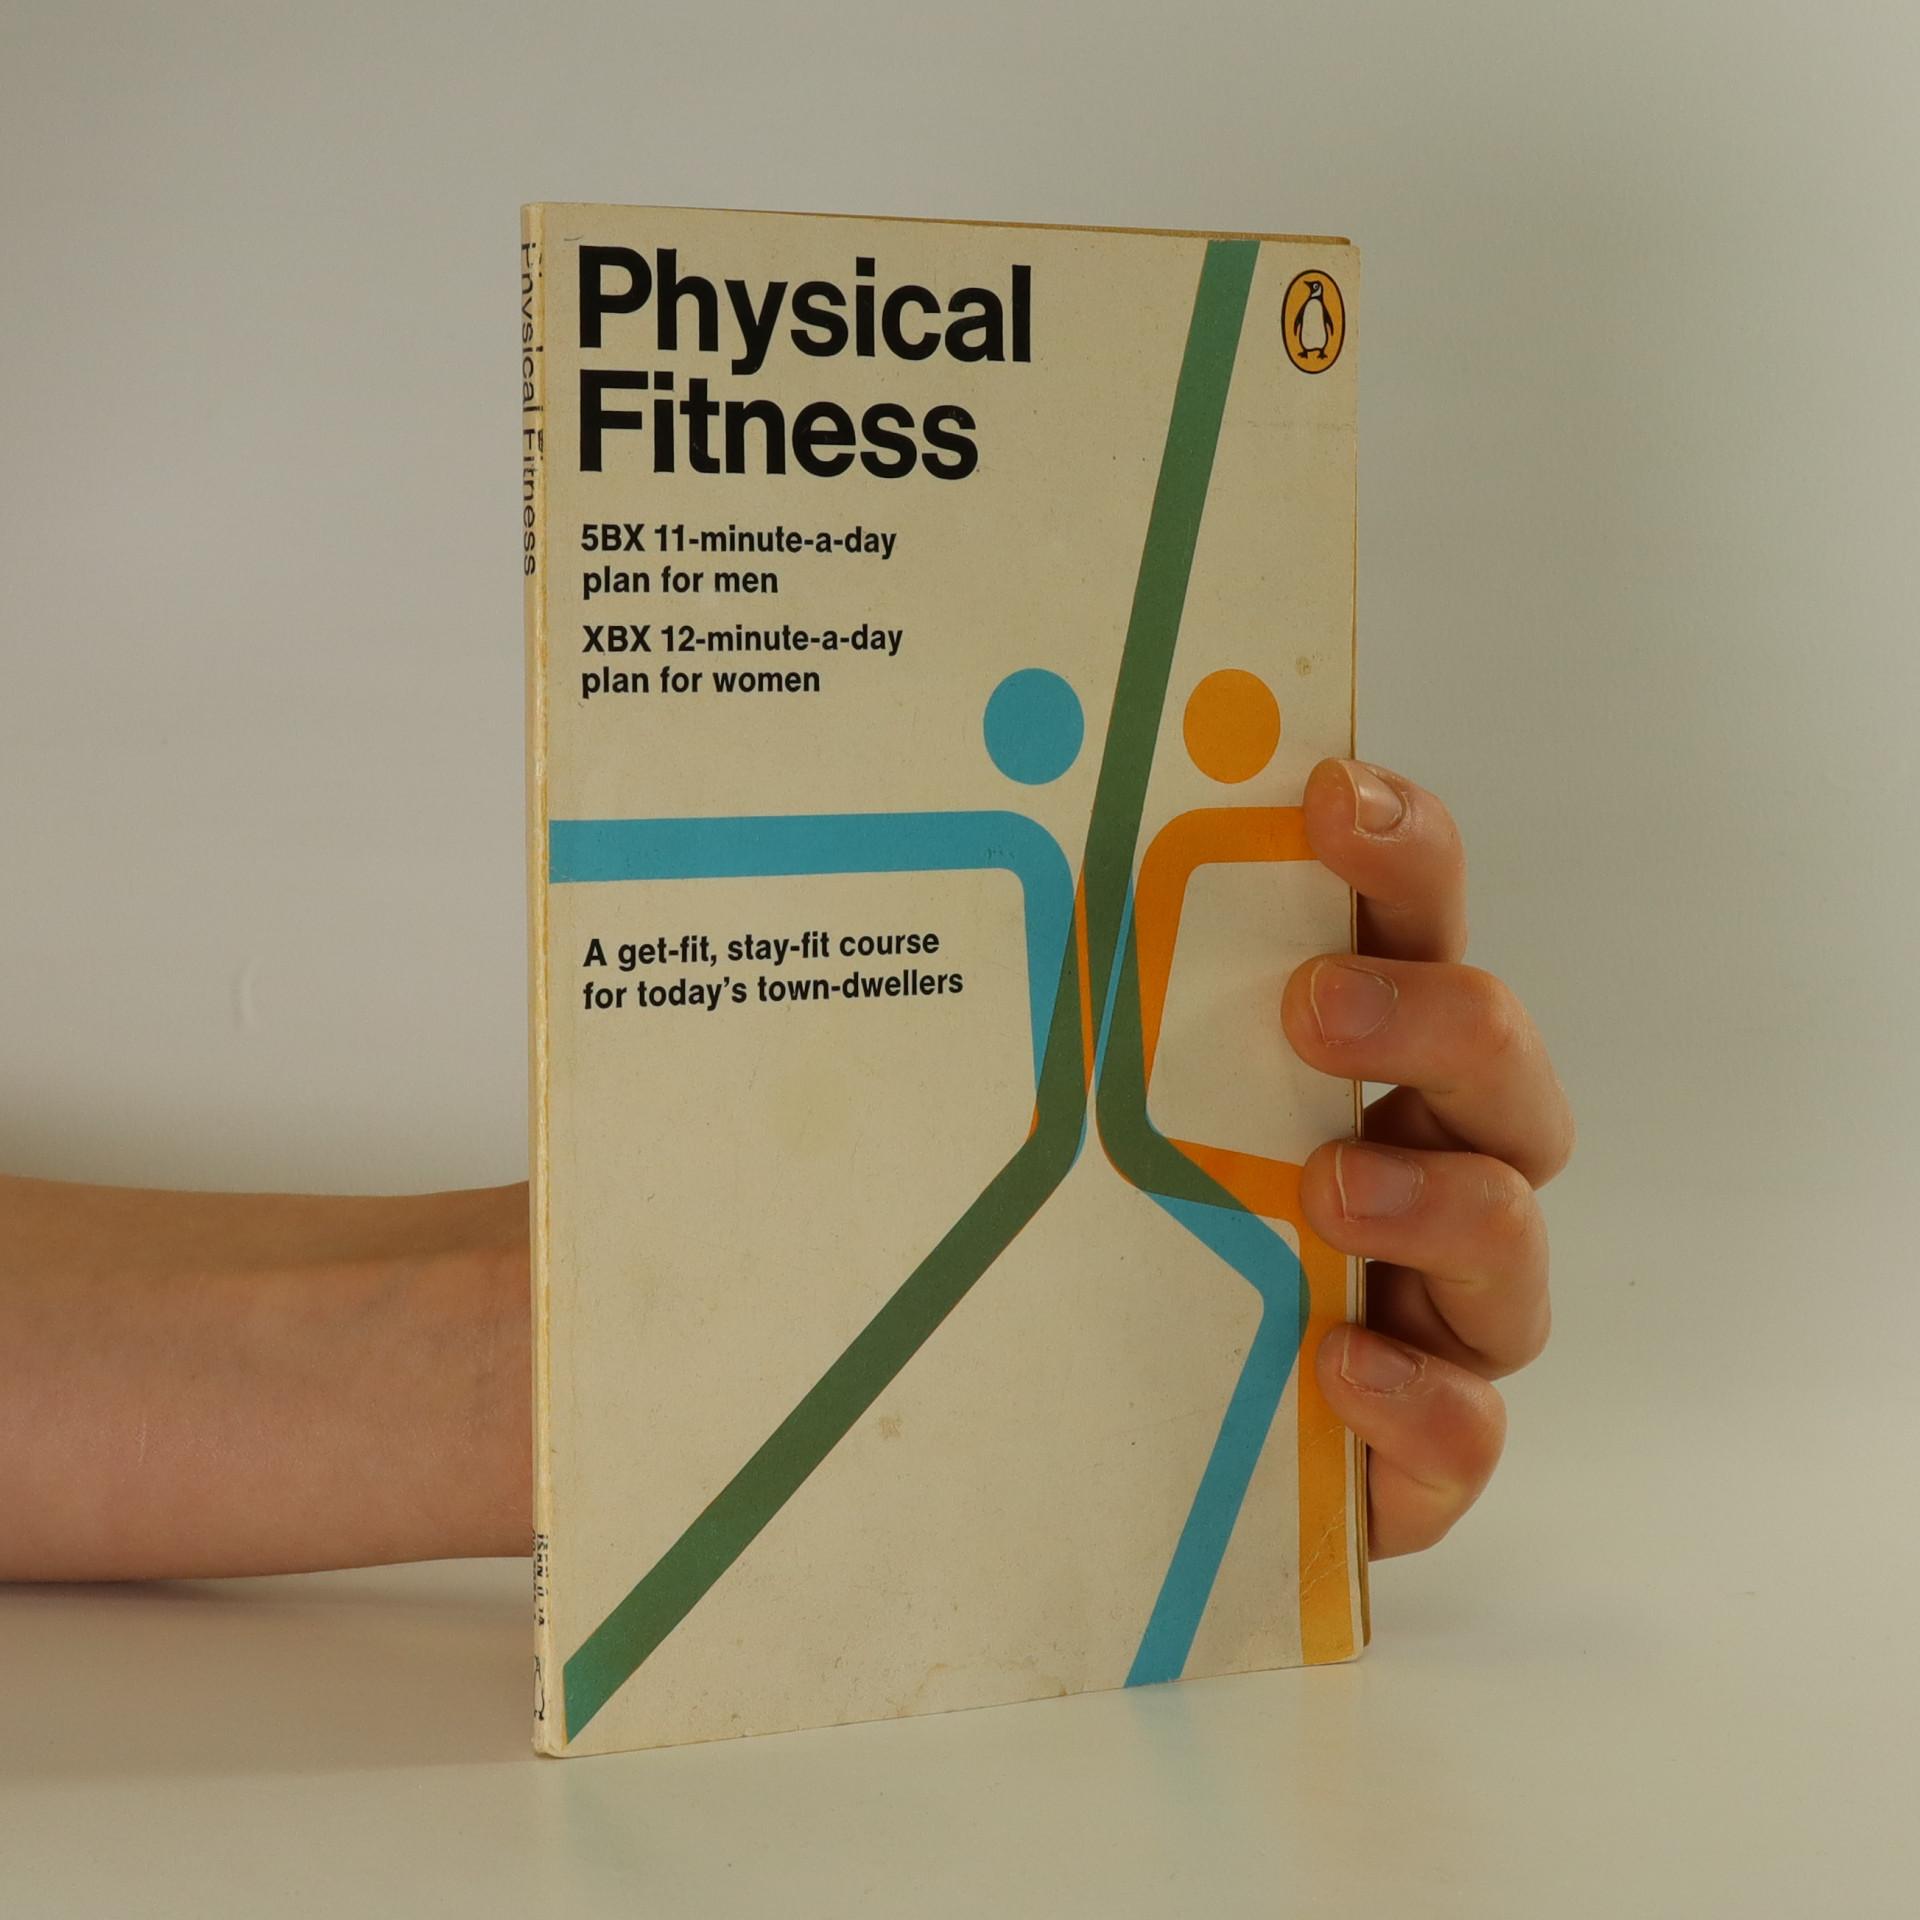 antikvární kniha Physical Fitness, 1982